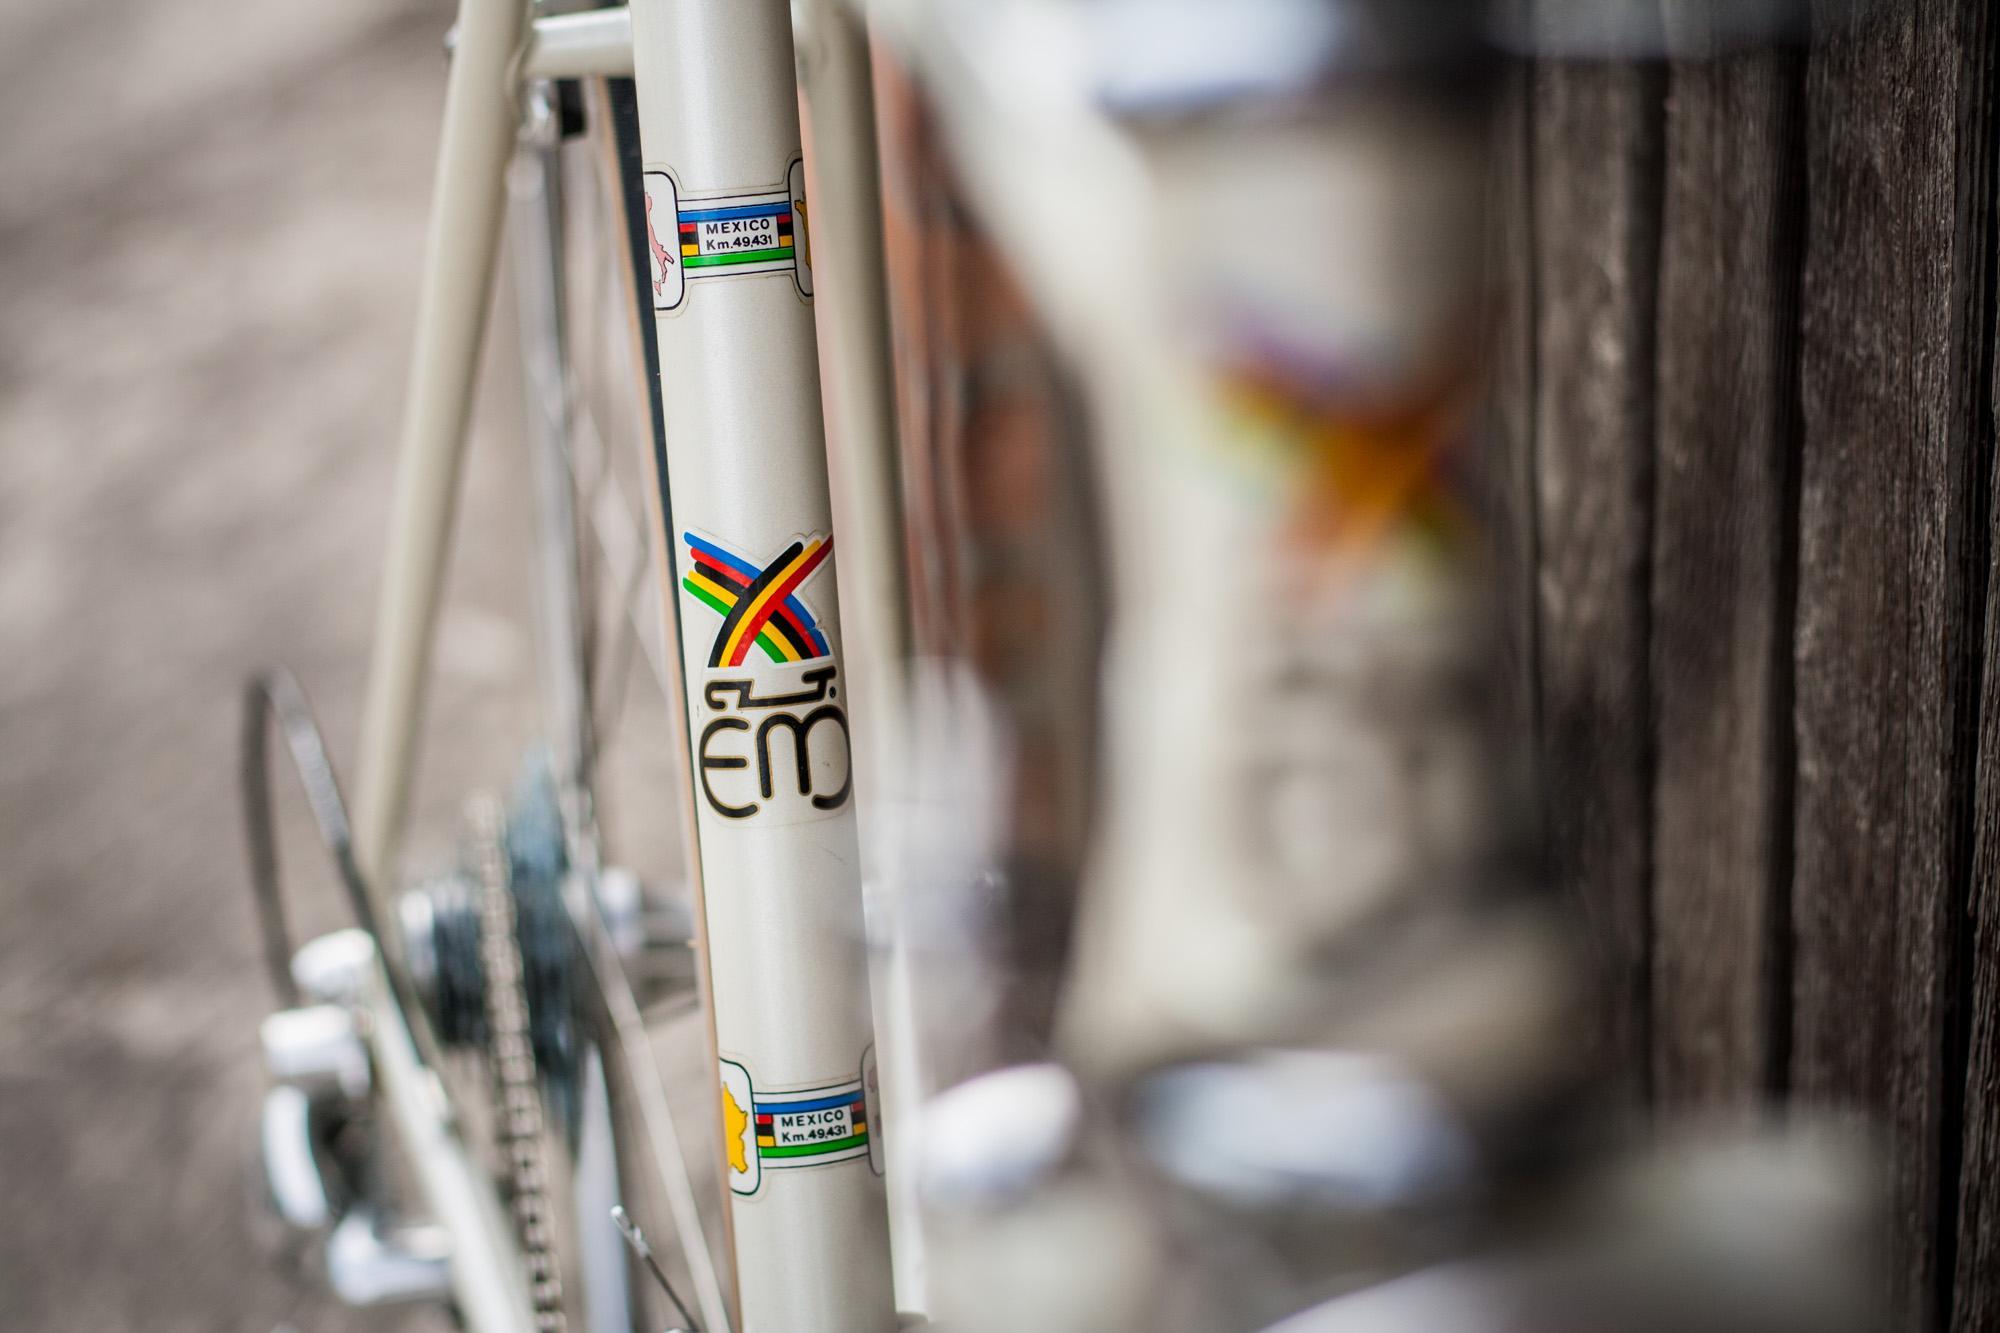 Karen is the Original Owner of this '80s Eddy Merckx –Morgan